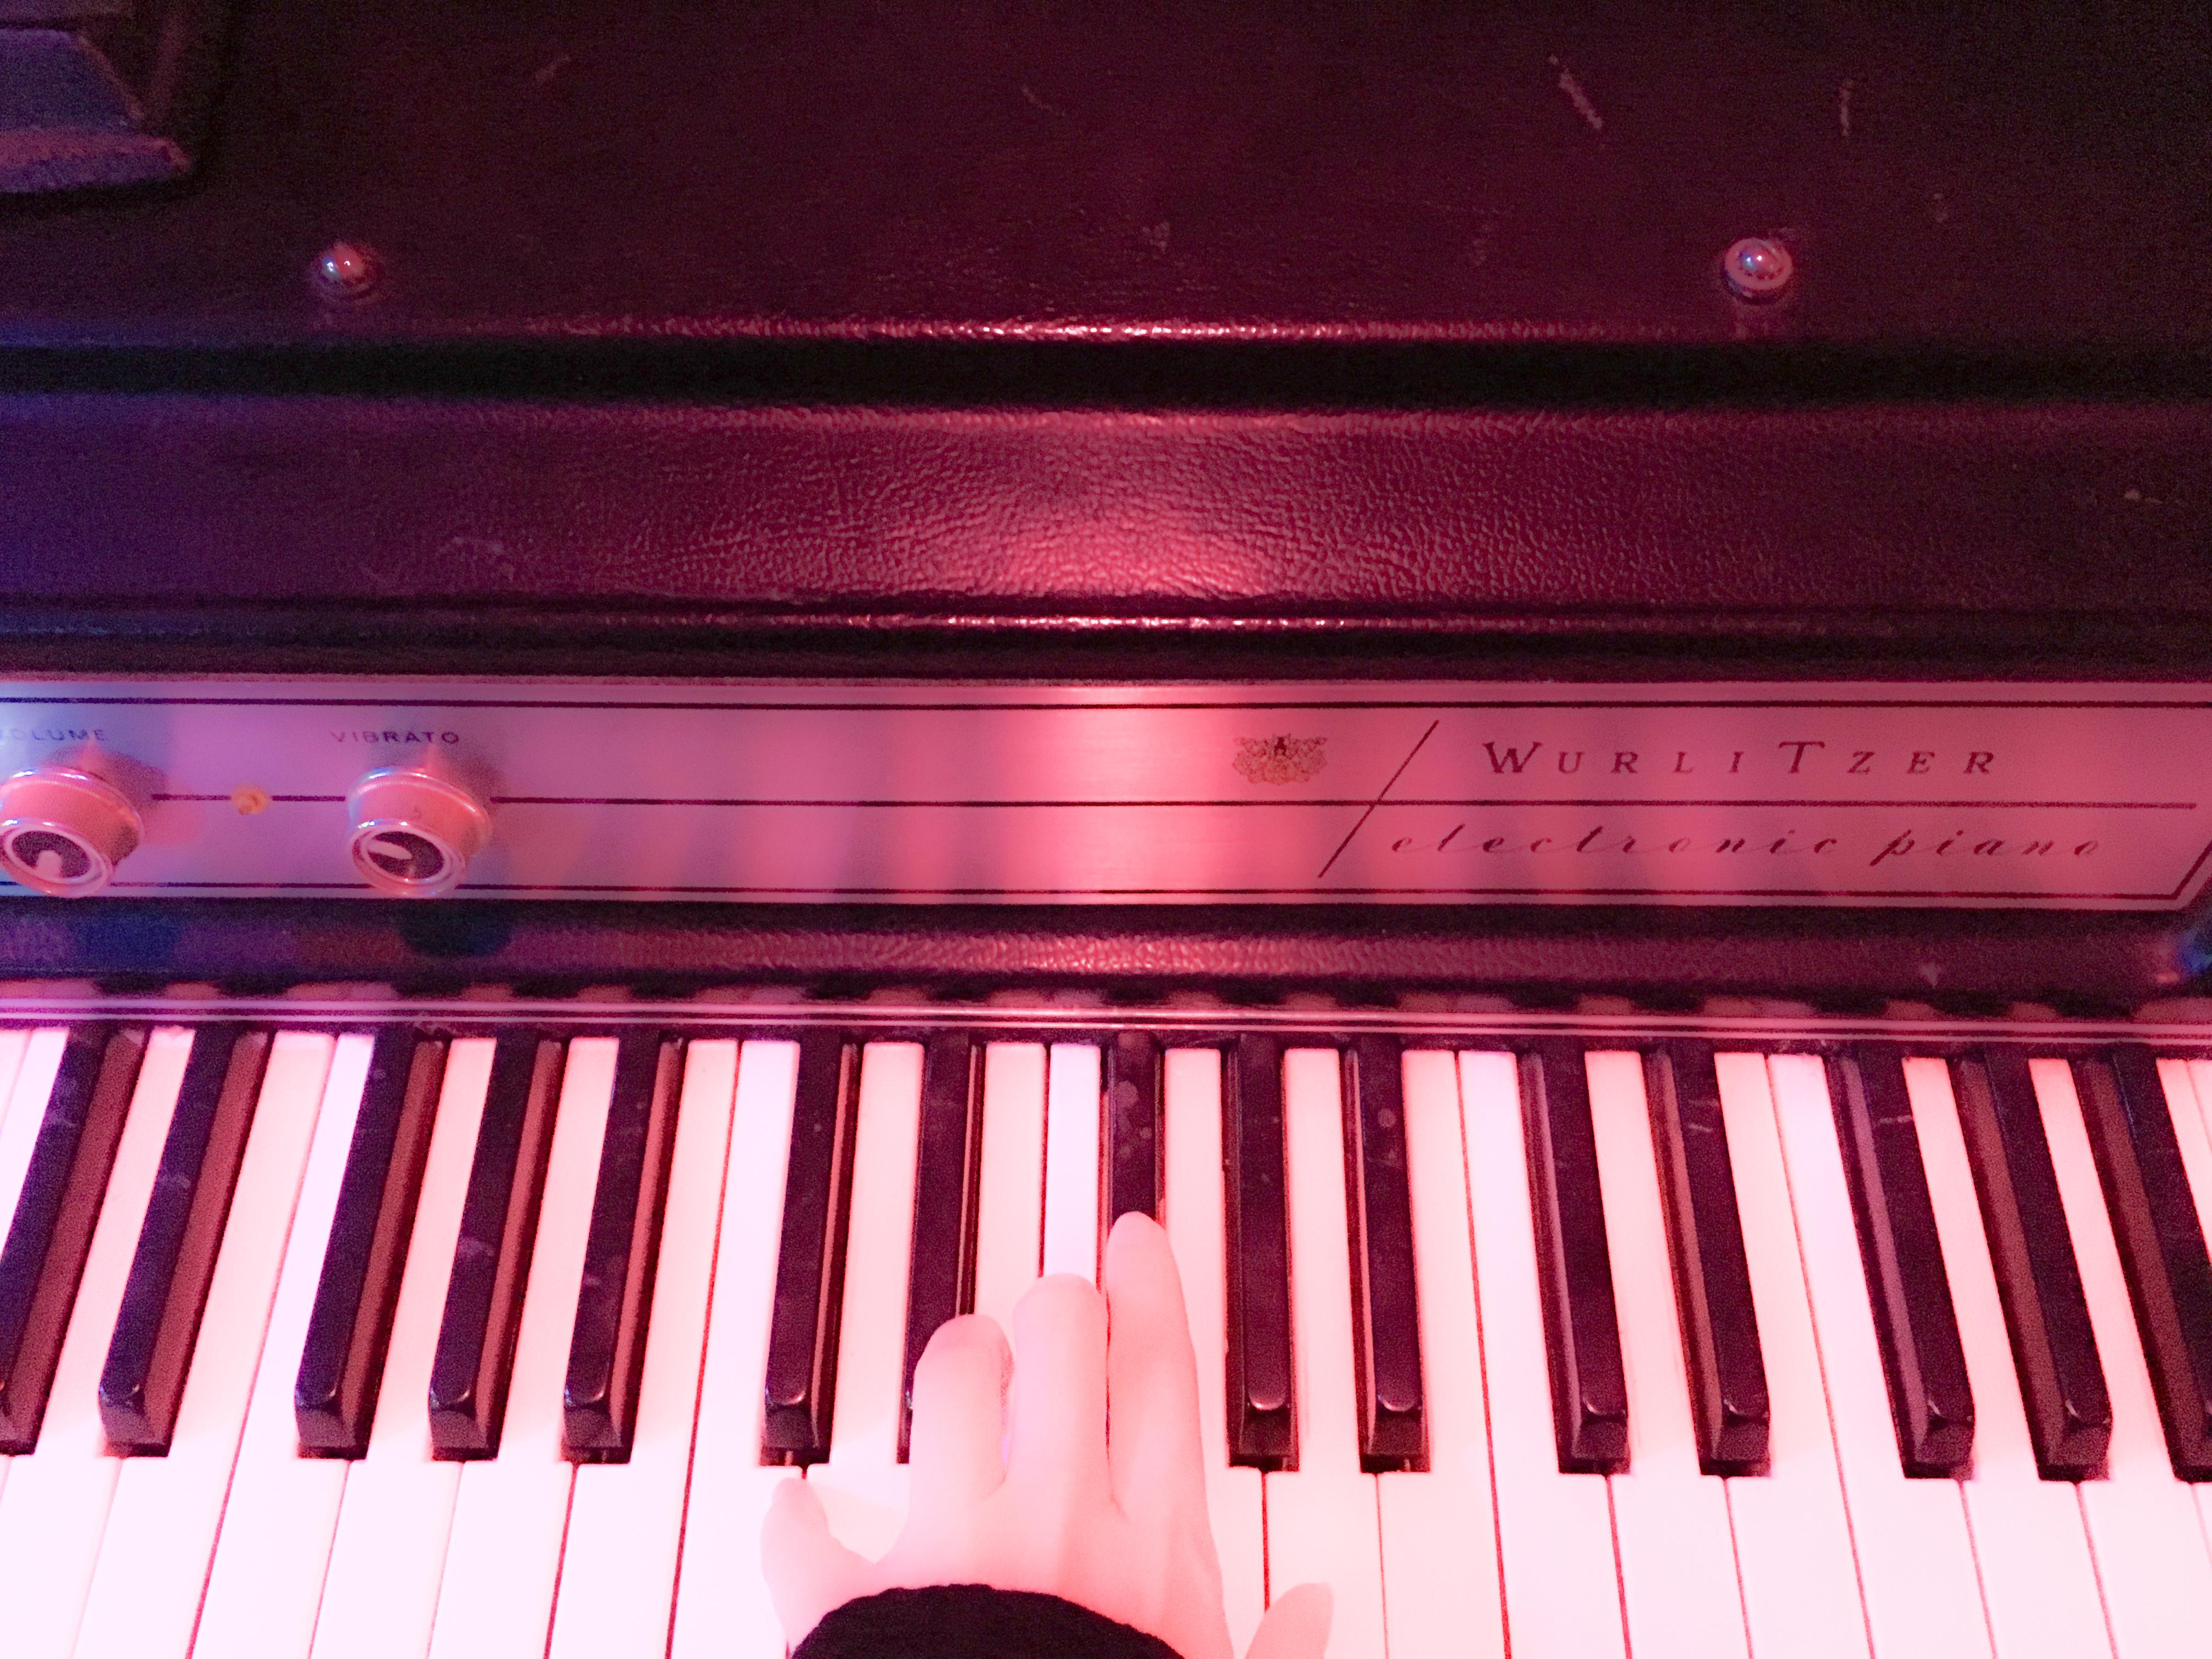 Wurlitzer Electronic Piano